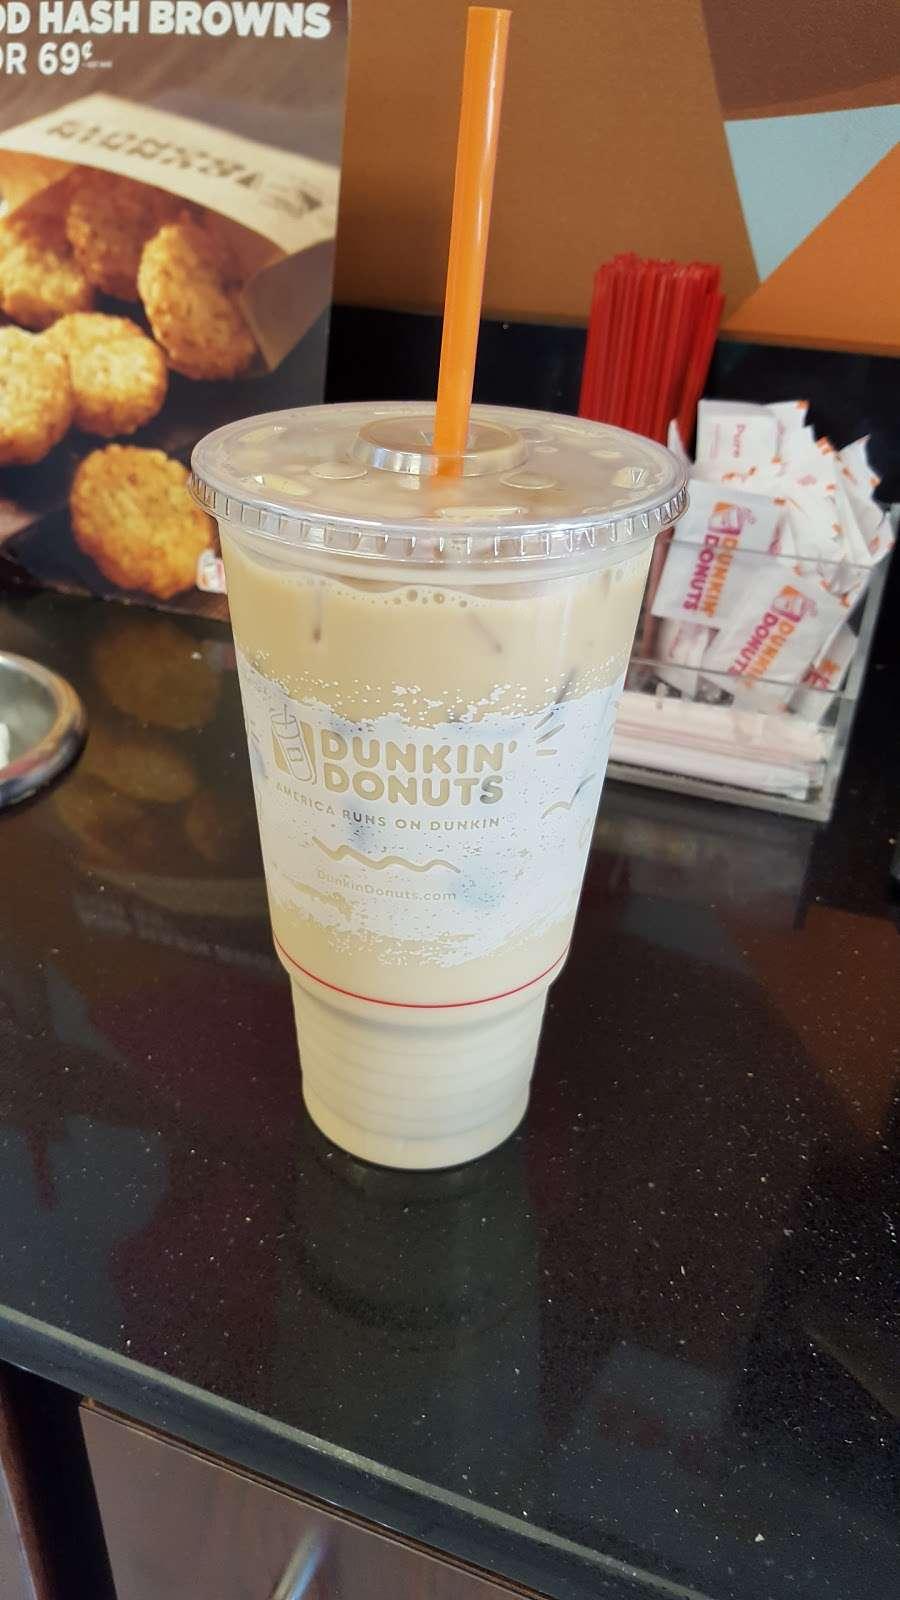 Dunkin Donuts - cafe    Photo 1 of 10   Address: 410 Lalor St, Trenton, NJ 08611, USA   Phone: (609) 394-0855